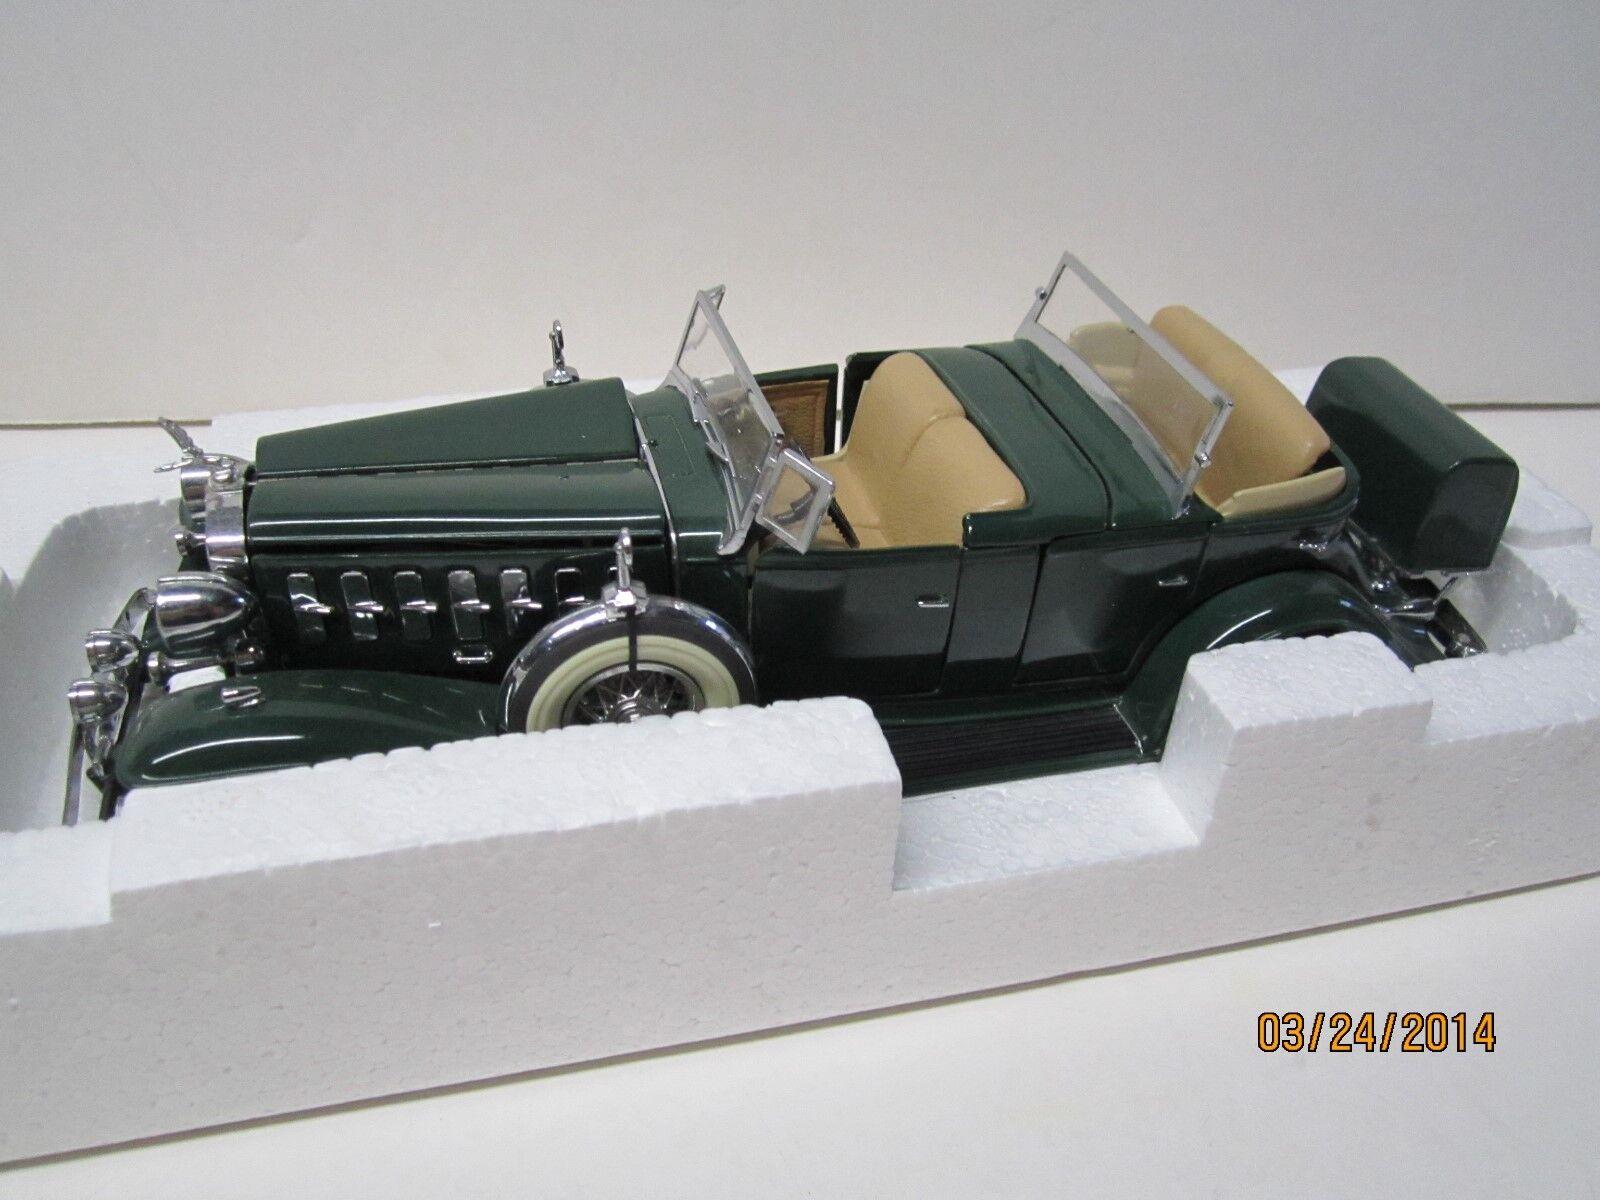 DANBURY Comme neuf 1932 ILLAC V-16 Sport Phaeton 1 24 dans la boîte d'orig